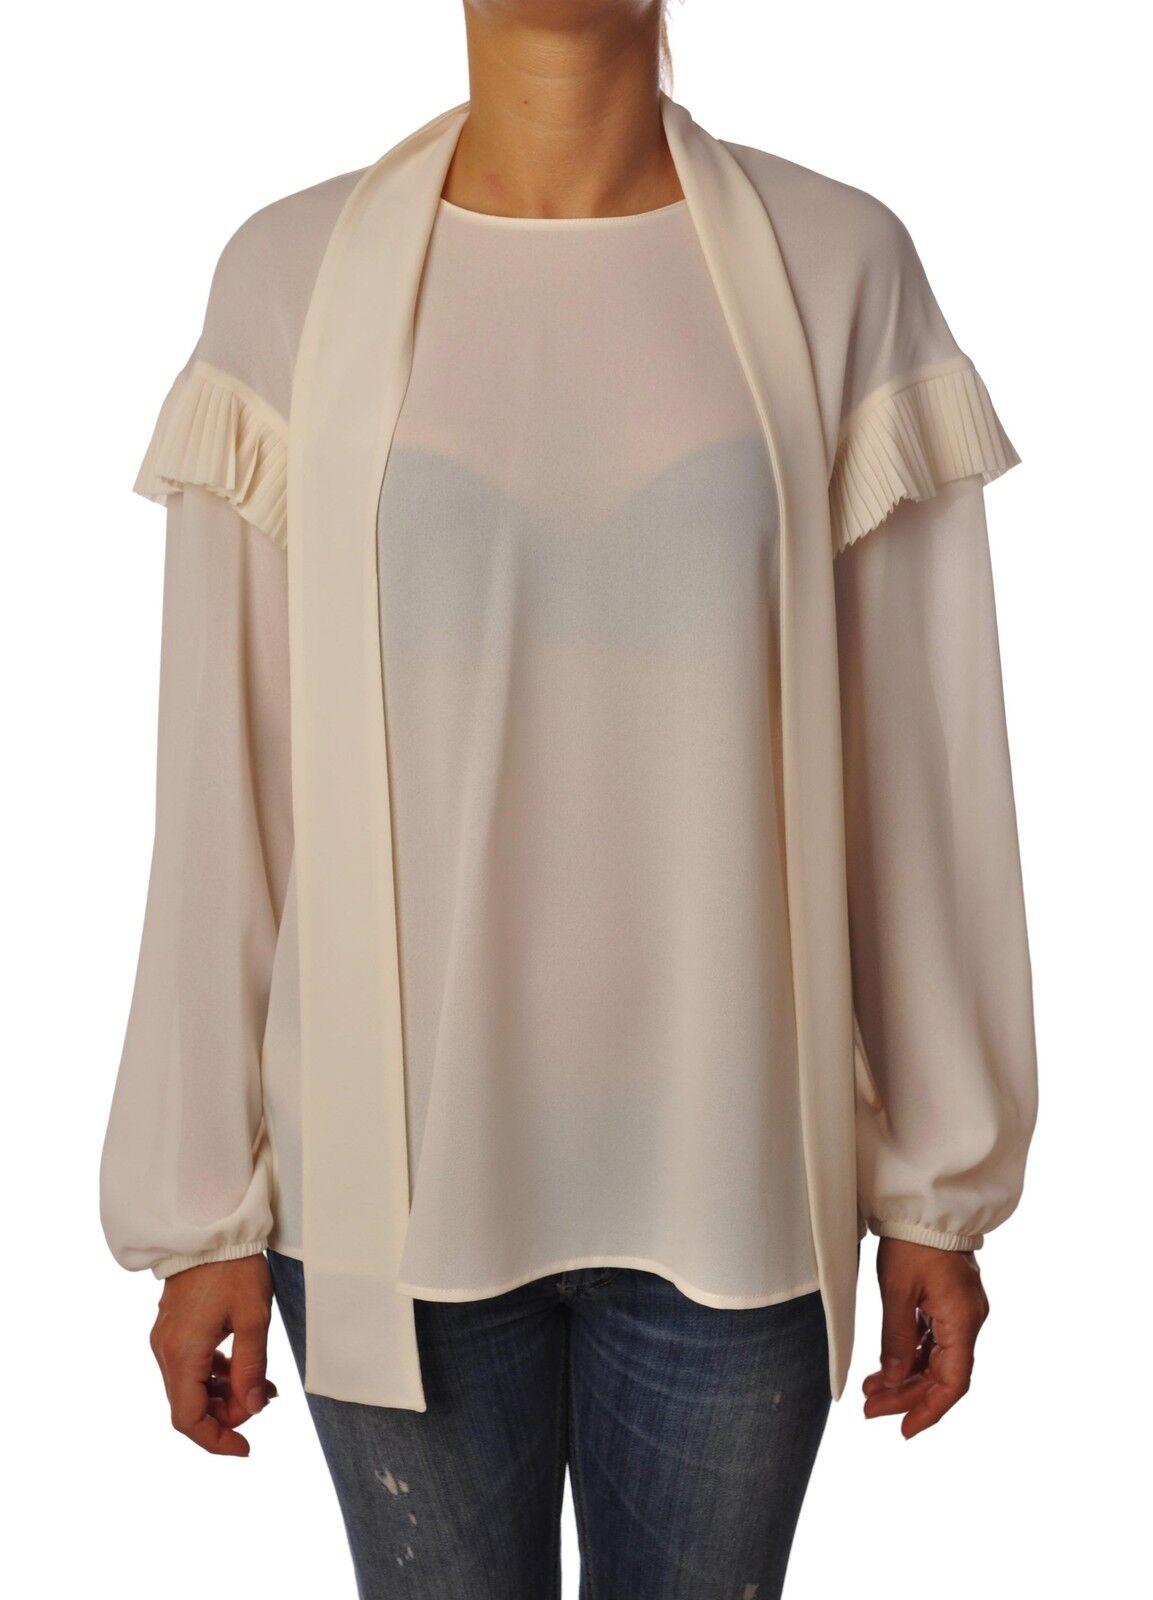 Pinko - Shirts-Shirt - Woman - White - 3896330L184128